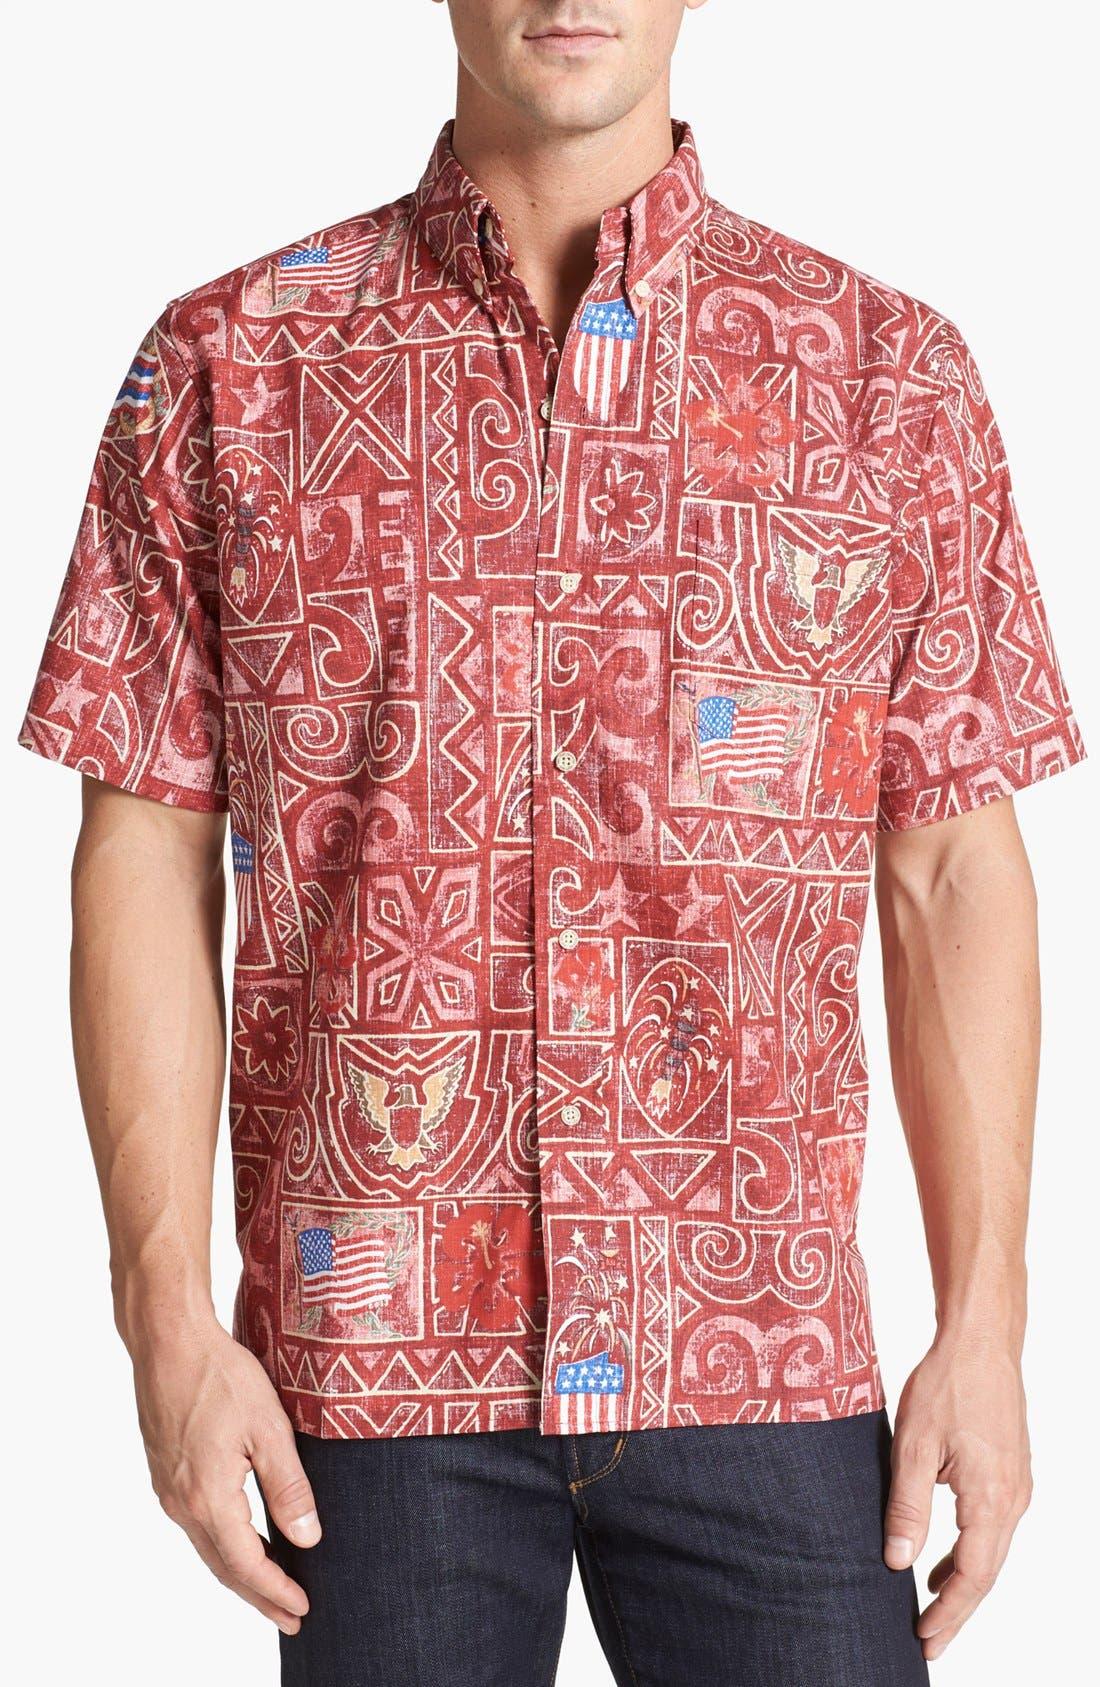 Alternate Image 1 Selected - Reyn Spooner 'Summer Commemorative - 2013' Short Sleeve Sport Shirt